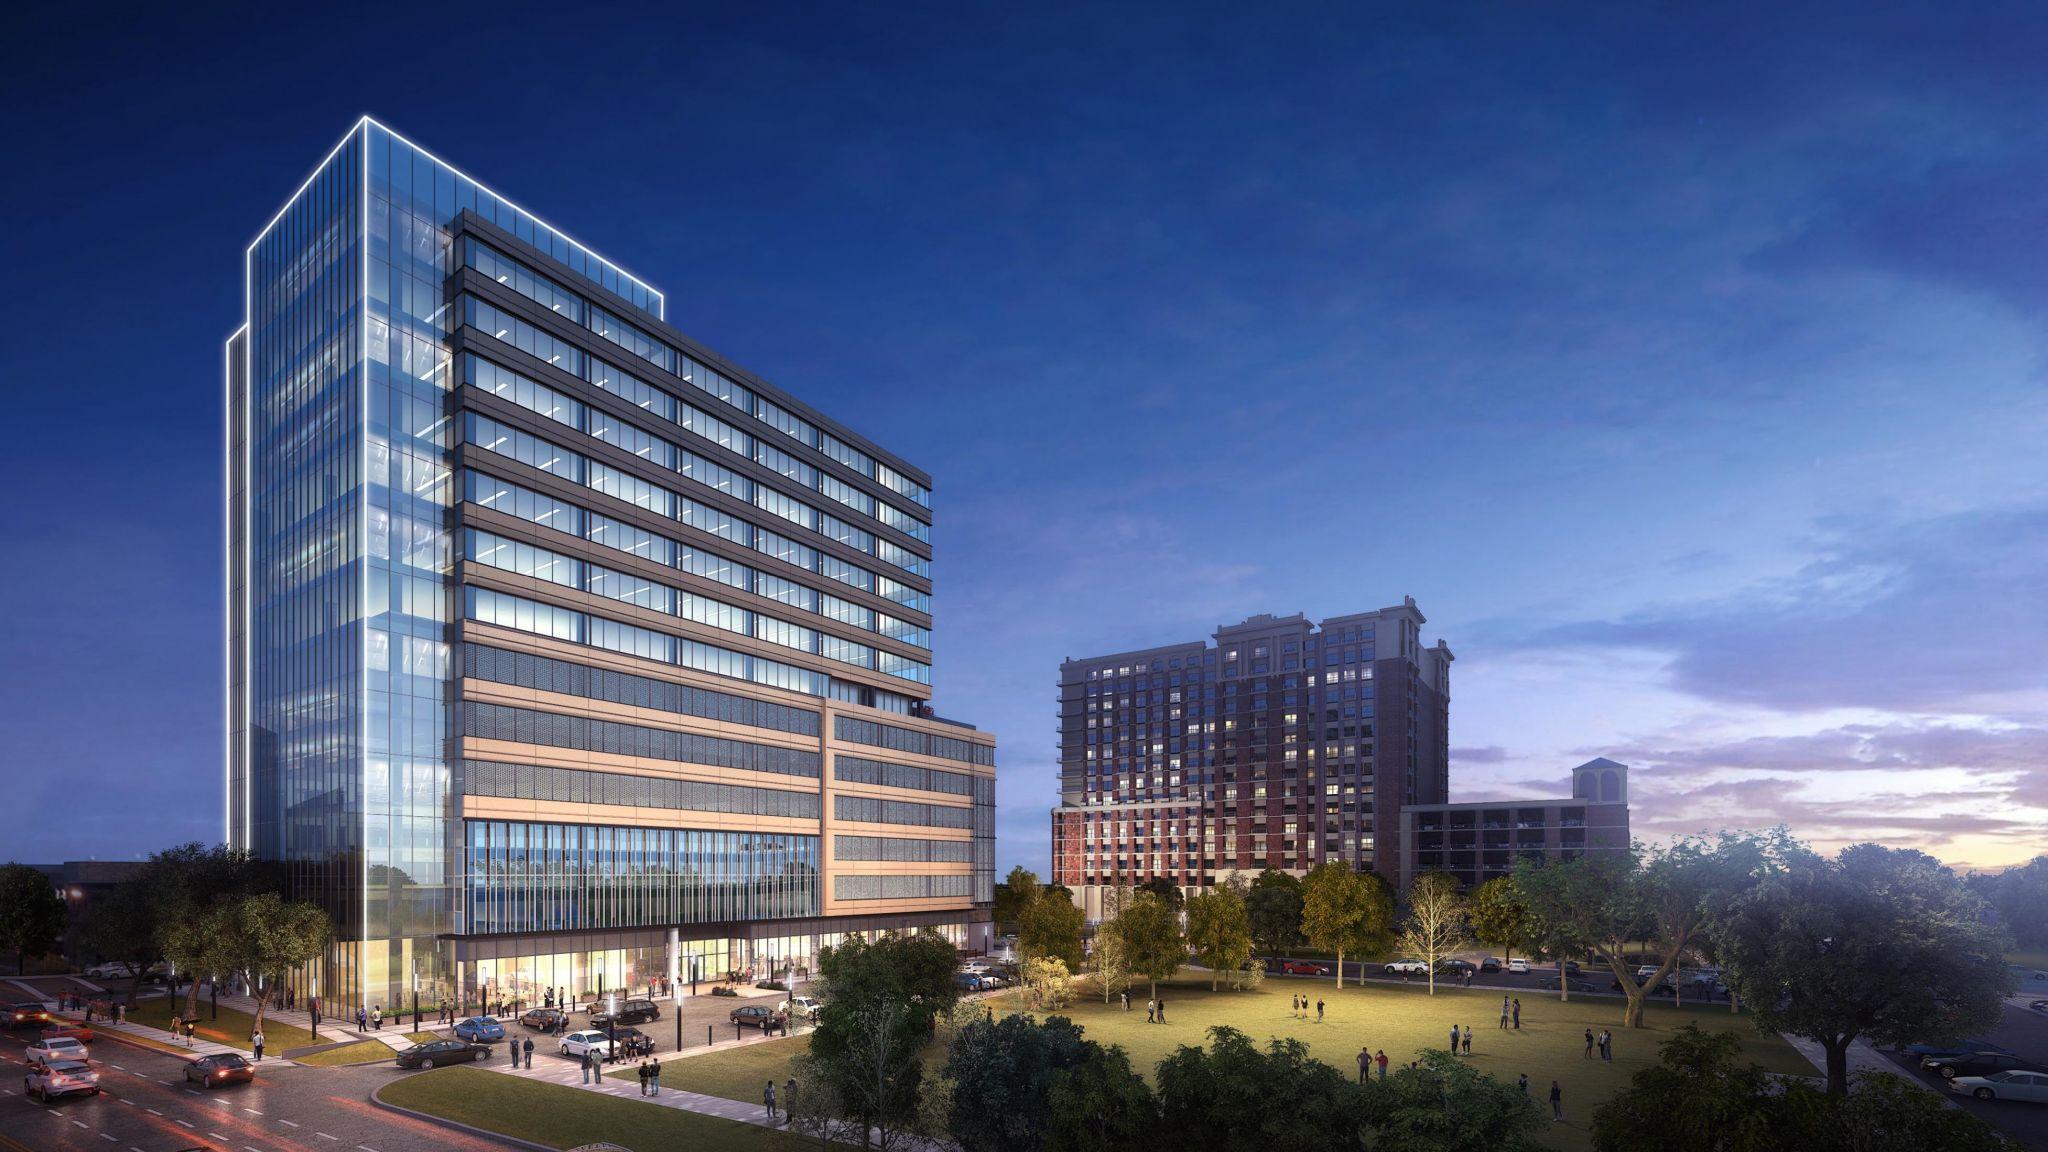 River Oaks Texas >> New tower planned in mixed-use development near River Oaks ...